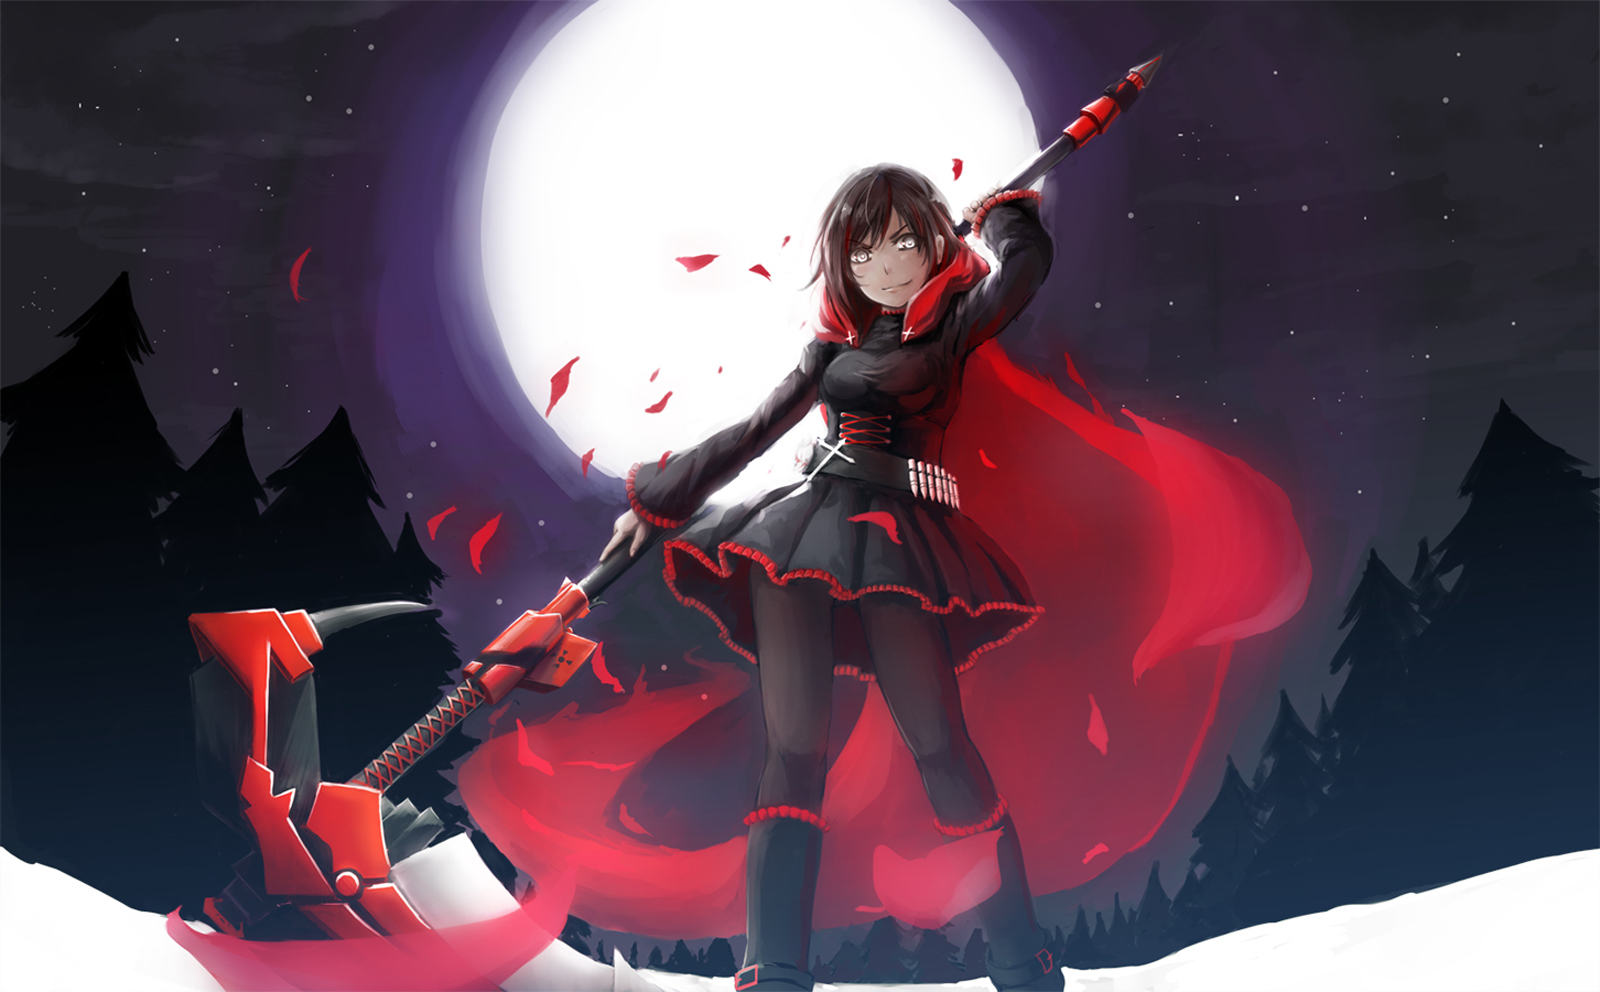 rwby anime scythe wallpaper - photo #7